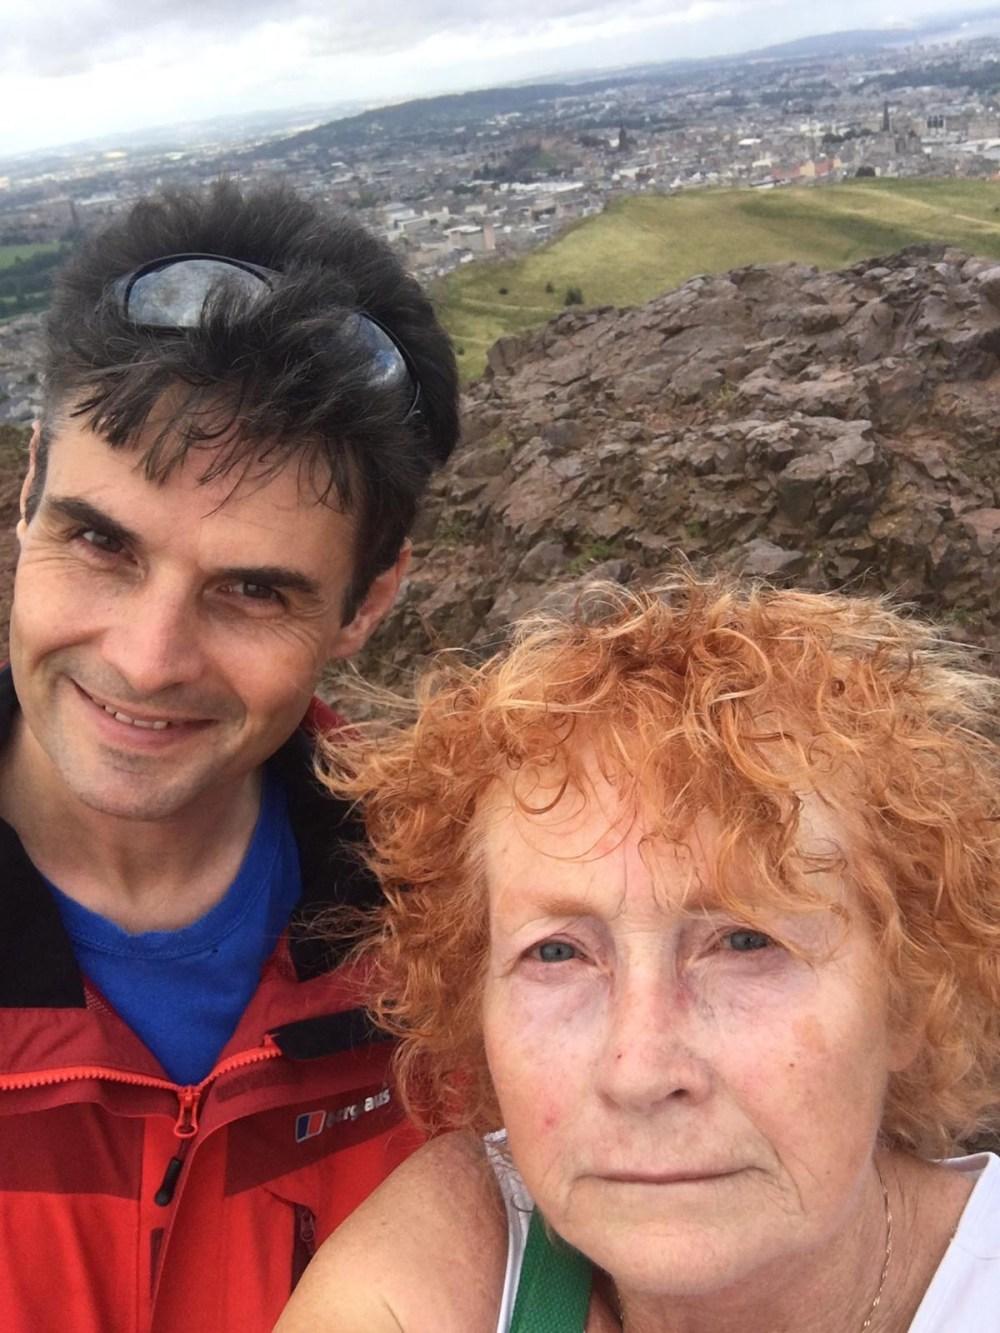 With Mam summit